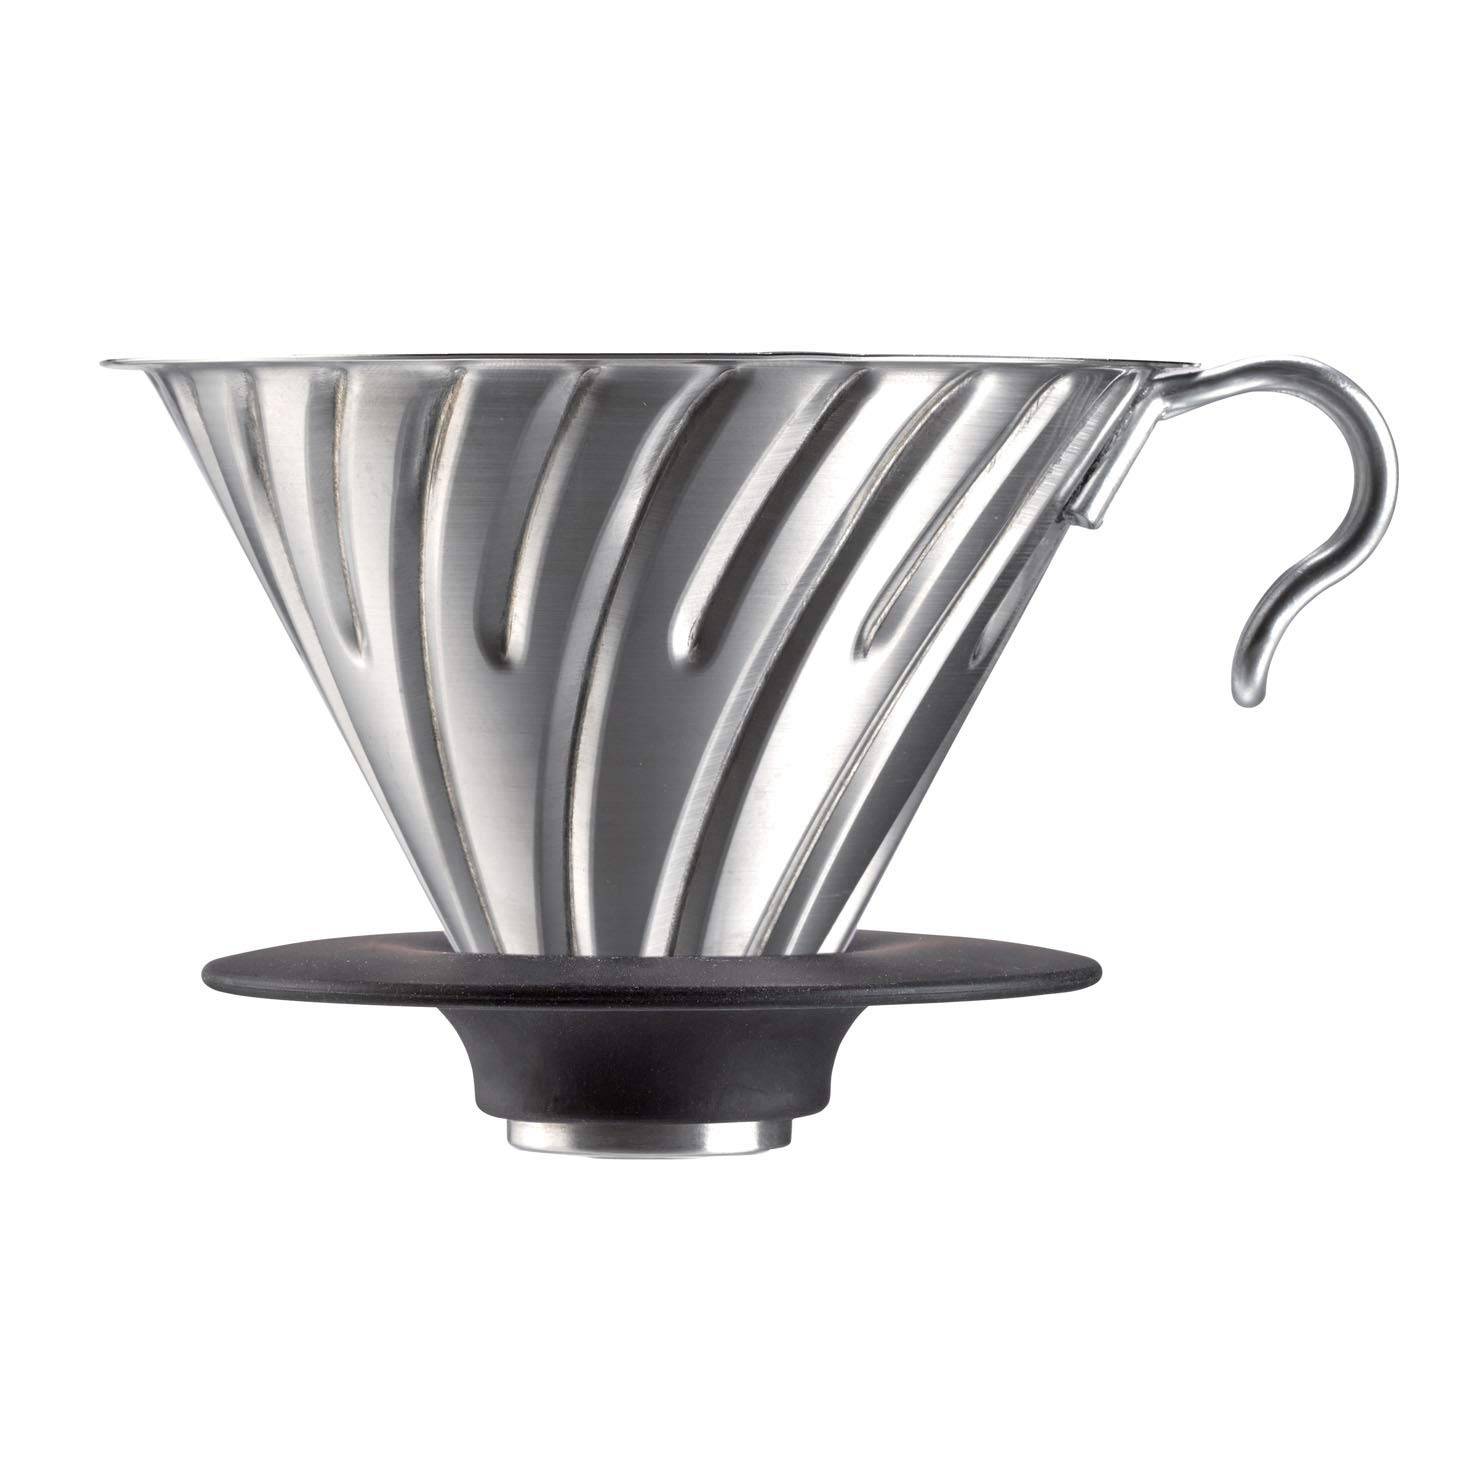 Hario 1-Piece Stainless Steel Metal Coffee Dripper, Copper VDM-02CP